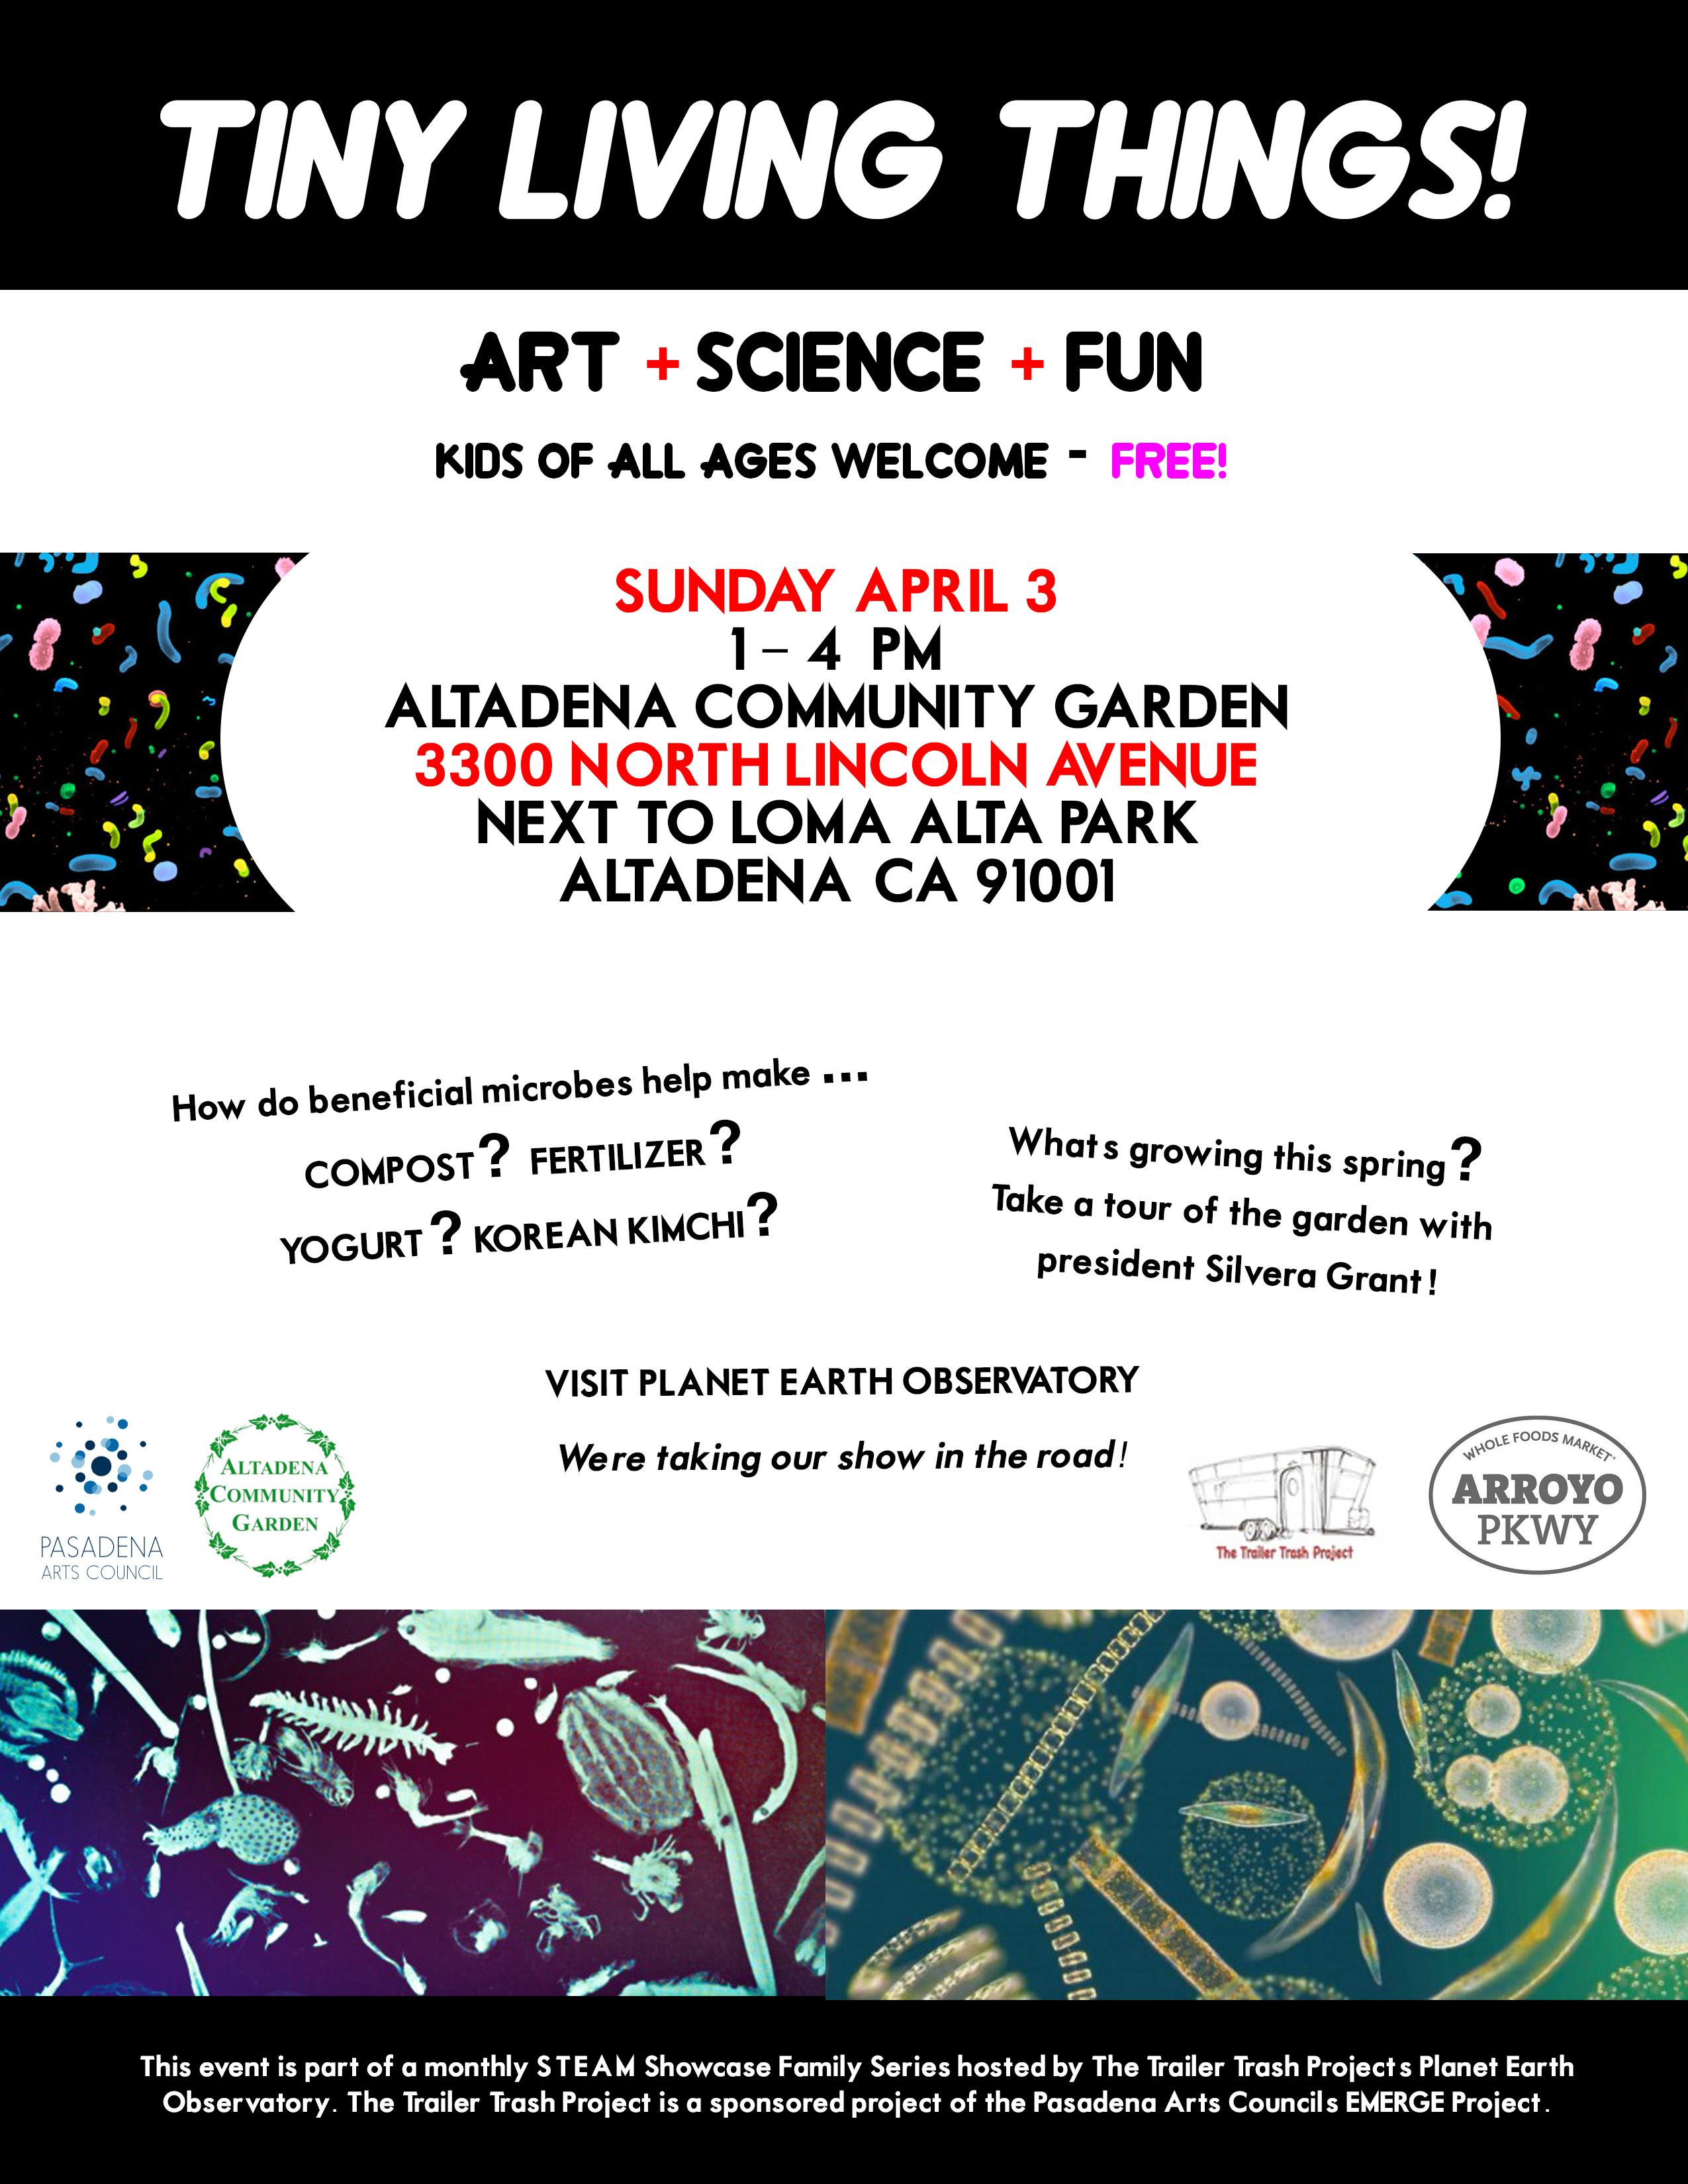 Tiny Living Things: Art + Science + Fun - Los Angeles Community